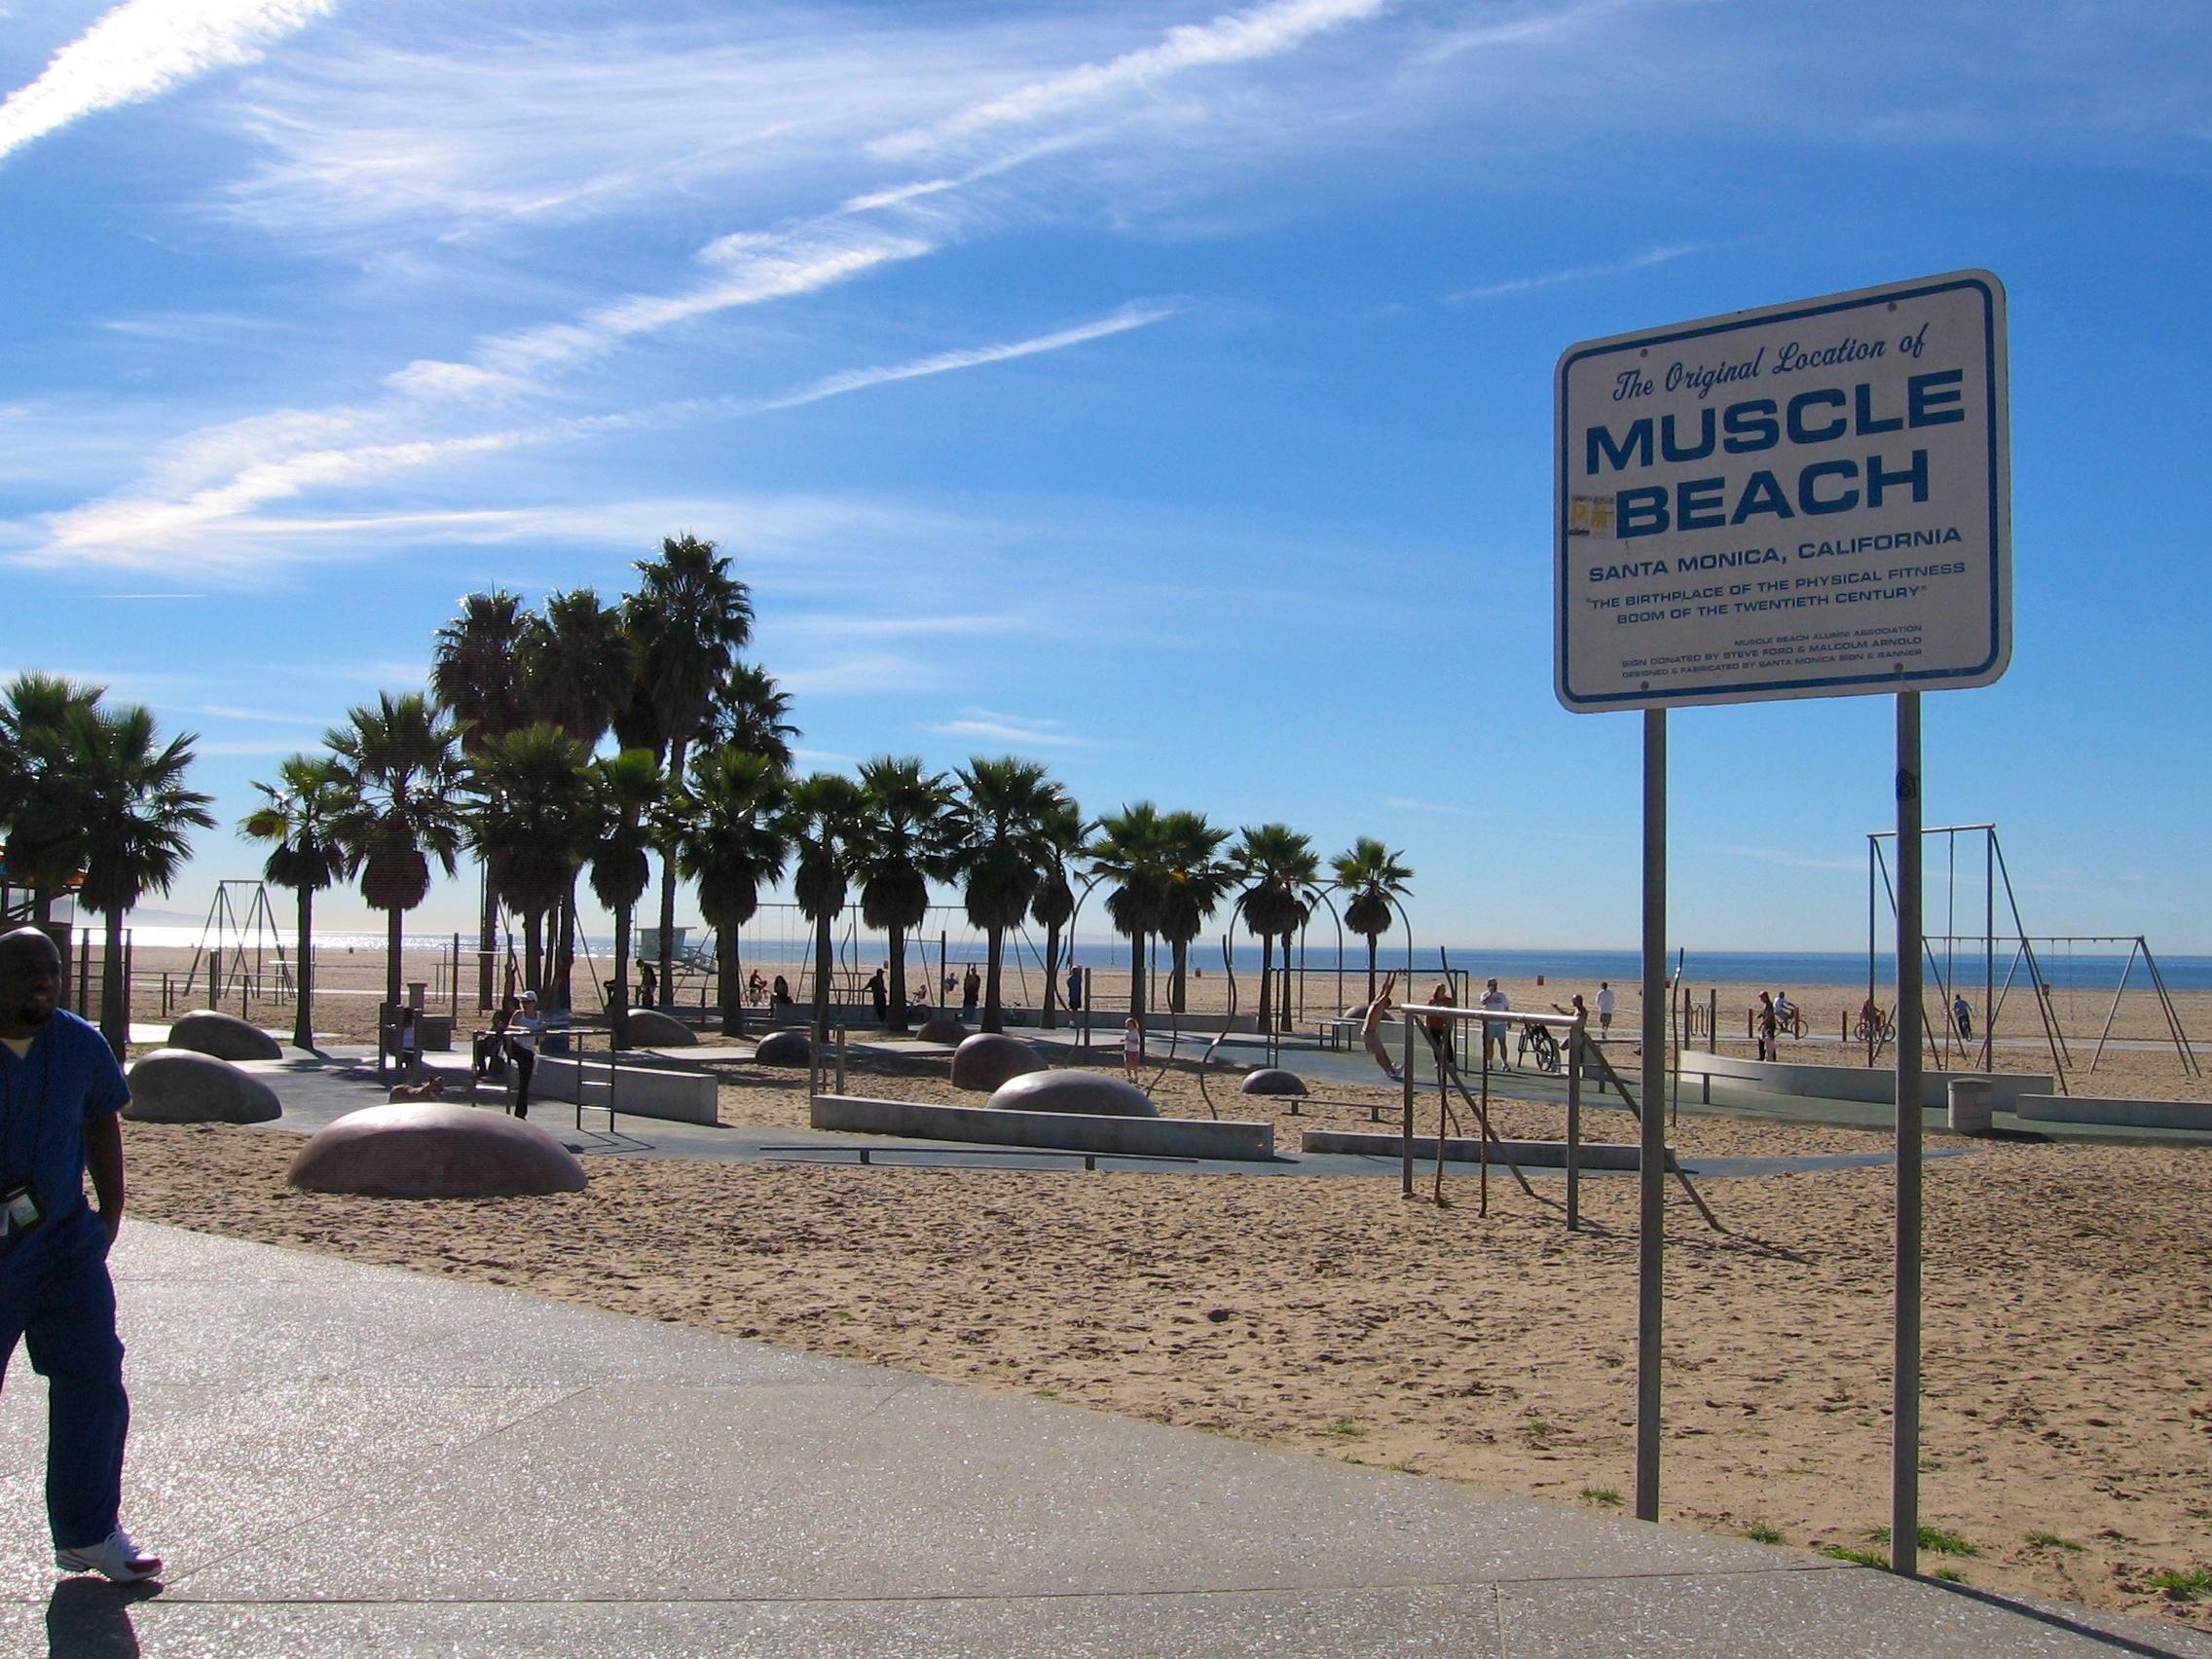 The Location Of Original Muscle Beachjpg